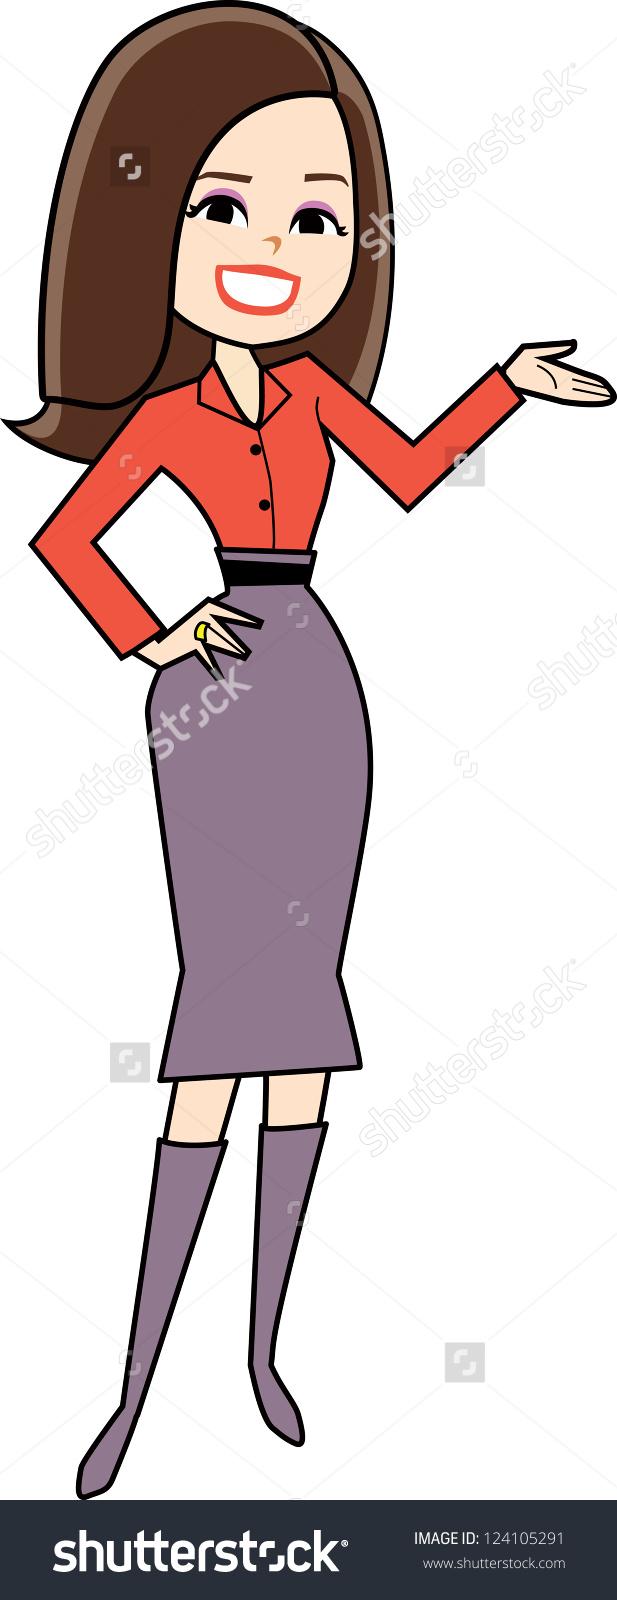 Cartoon Woman Clipart Retro Style Drawing Stock Vector 124105291.